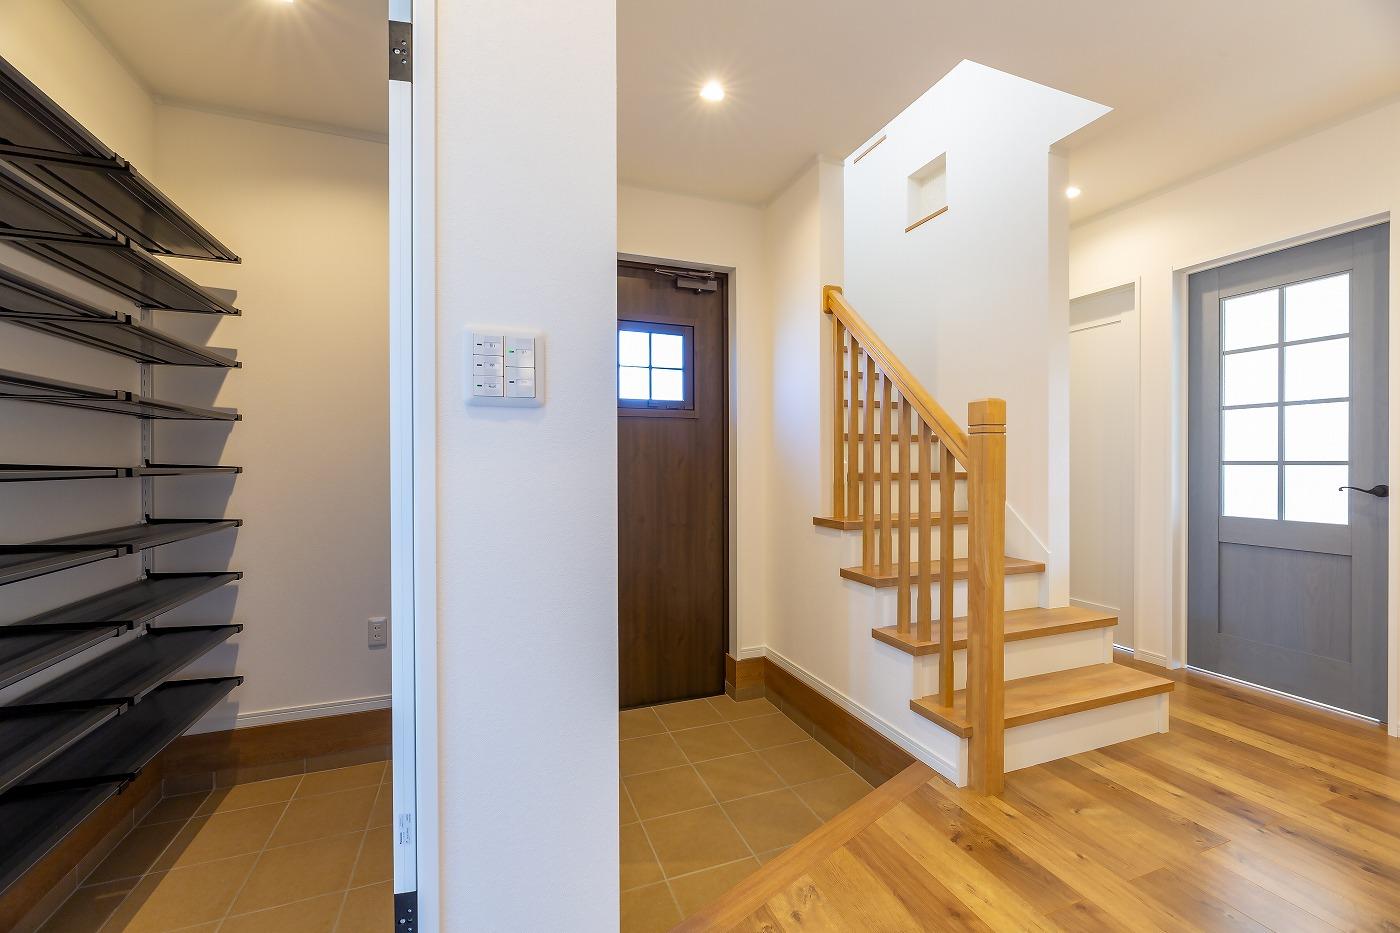 高松市の新築注文住宅の北欧風玄関